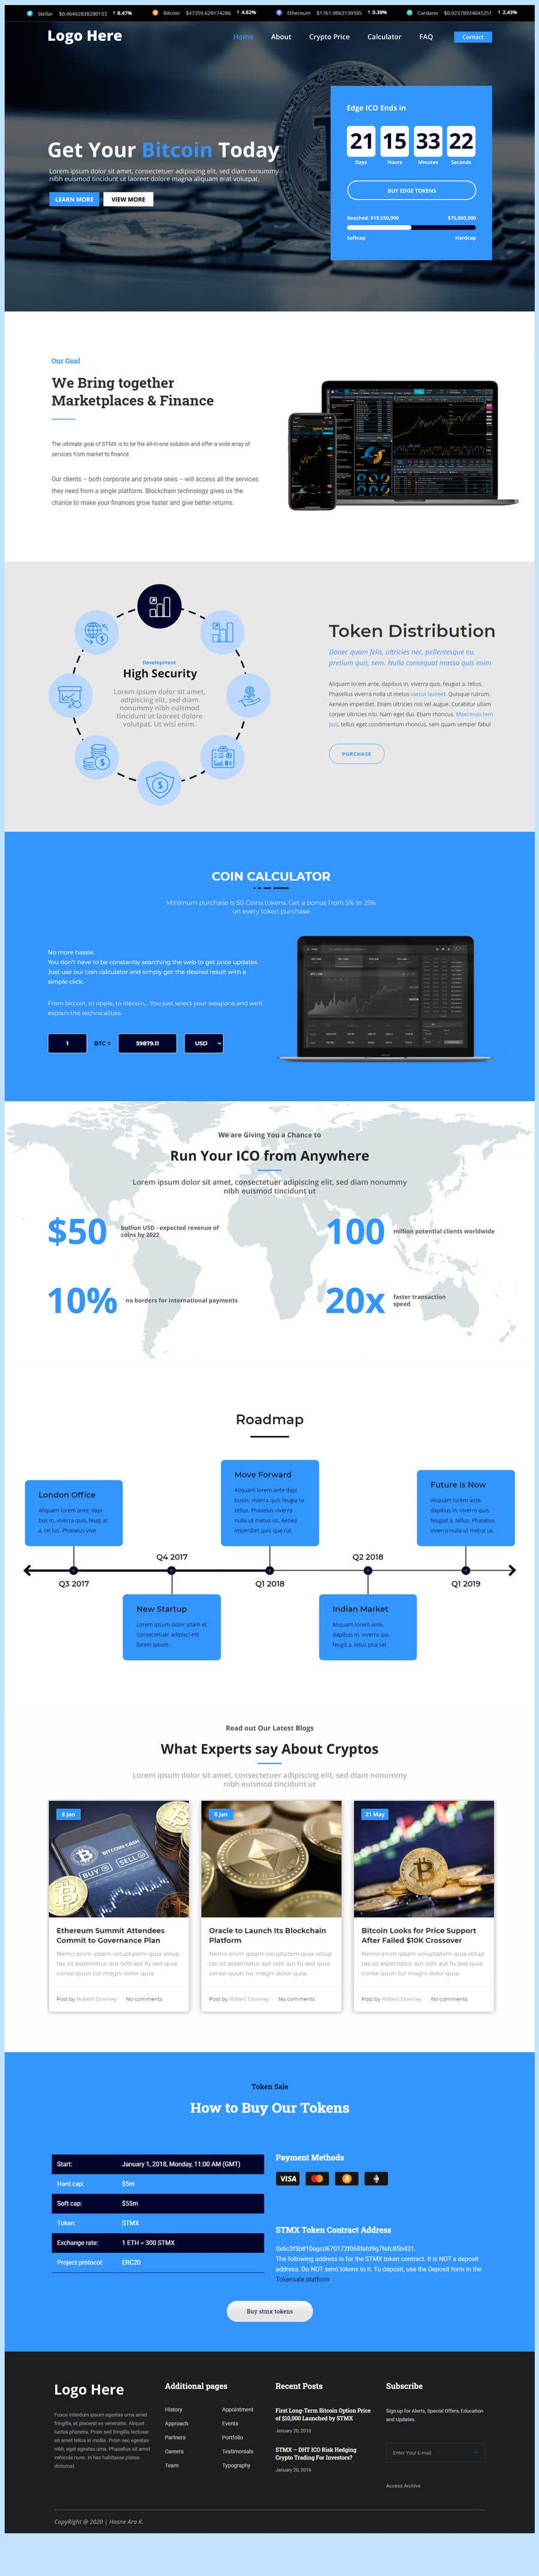 Penyertaan Peraduan #                                        4                                      untuk                                         Contest – Crypto Information Website Section: $100